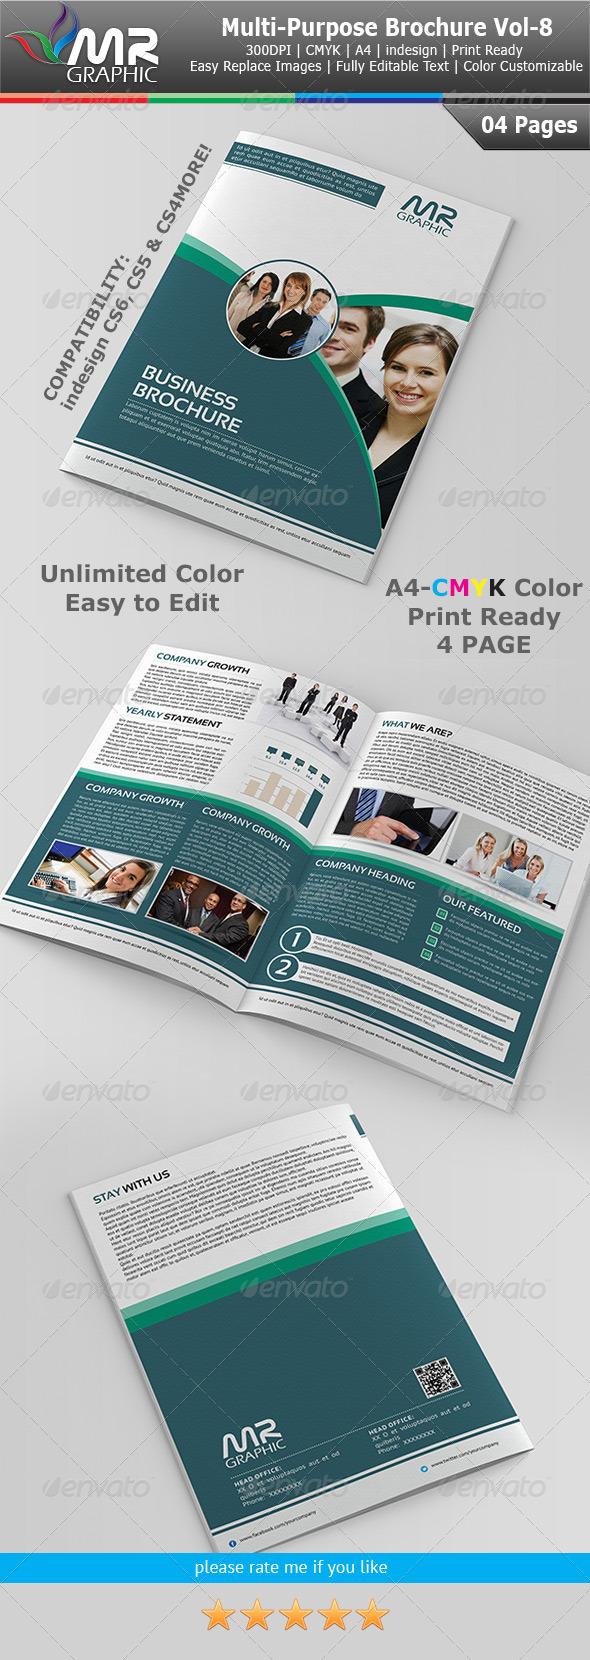 Multipurpose Business Brochure Vol-8 - Corporate Brochures